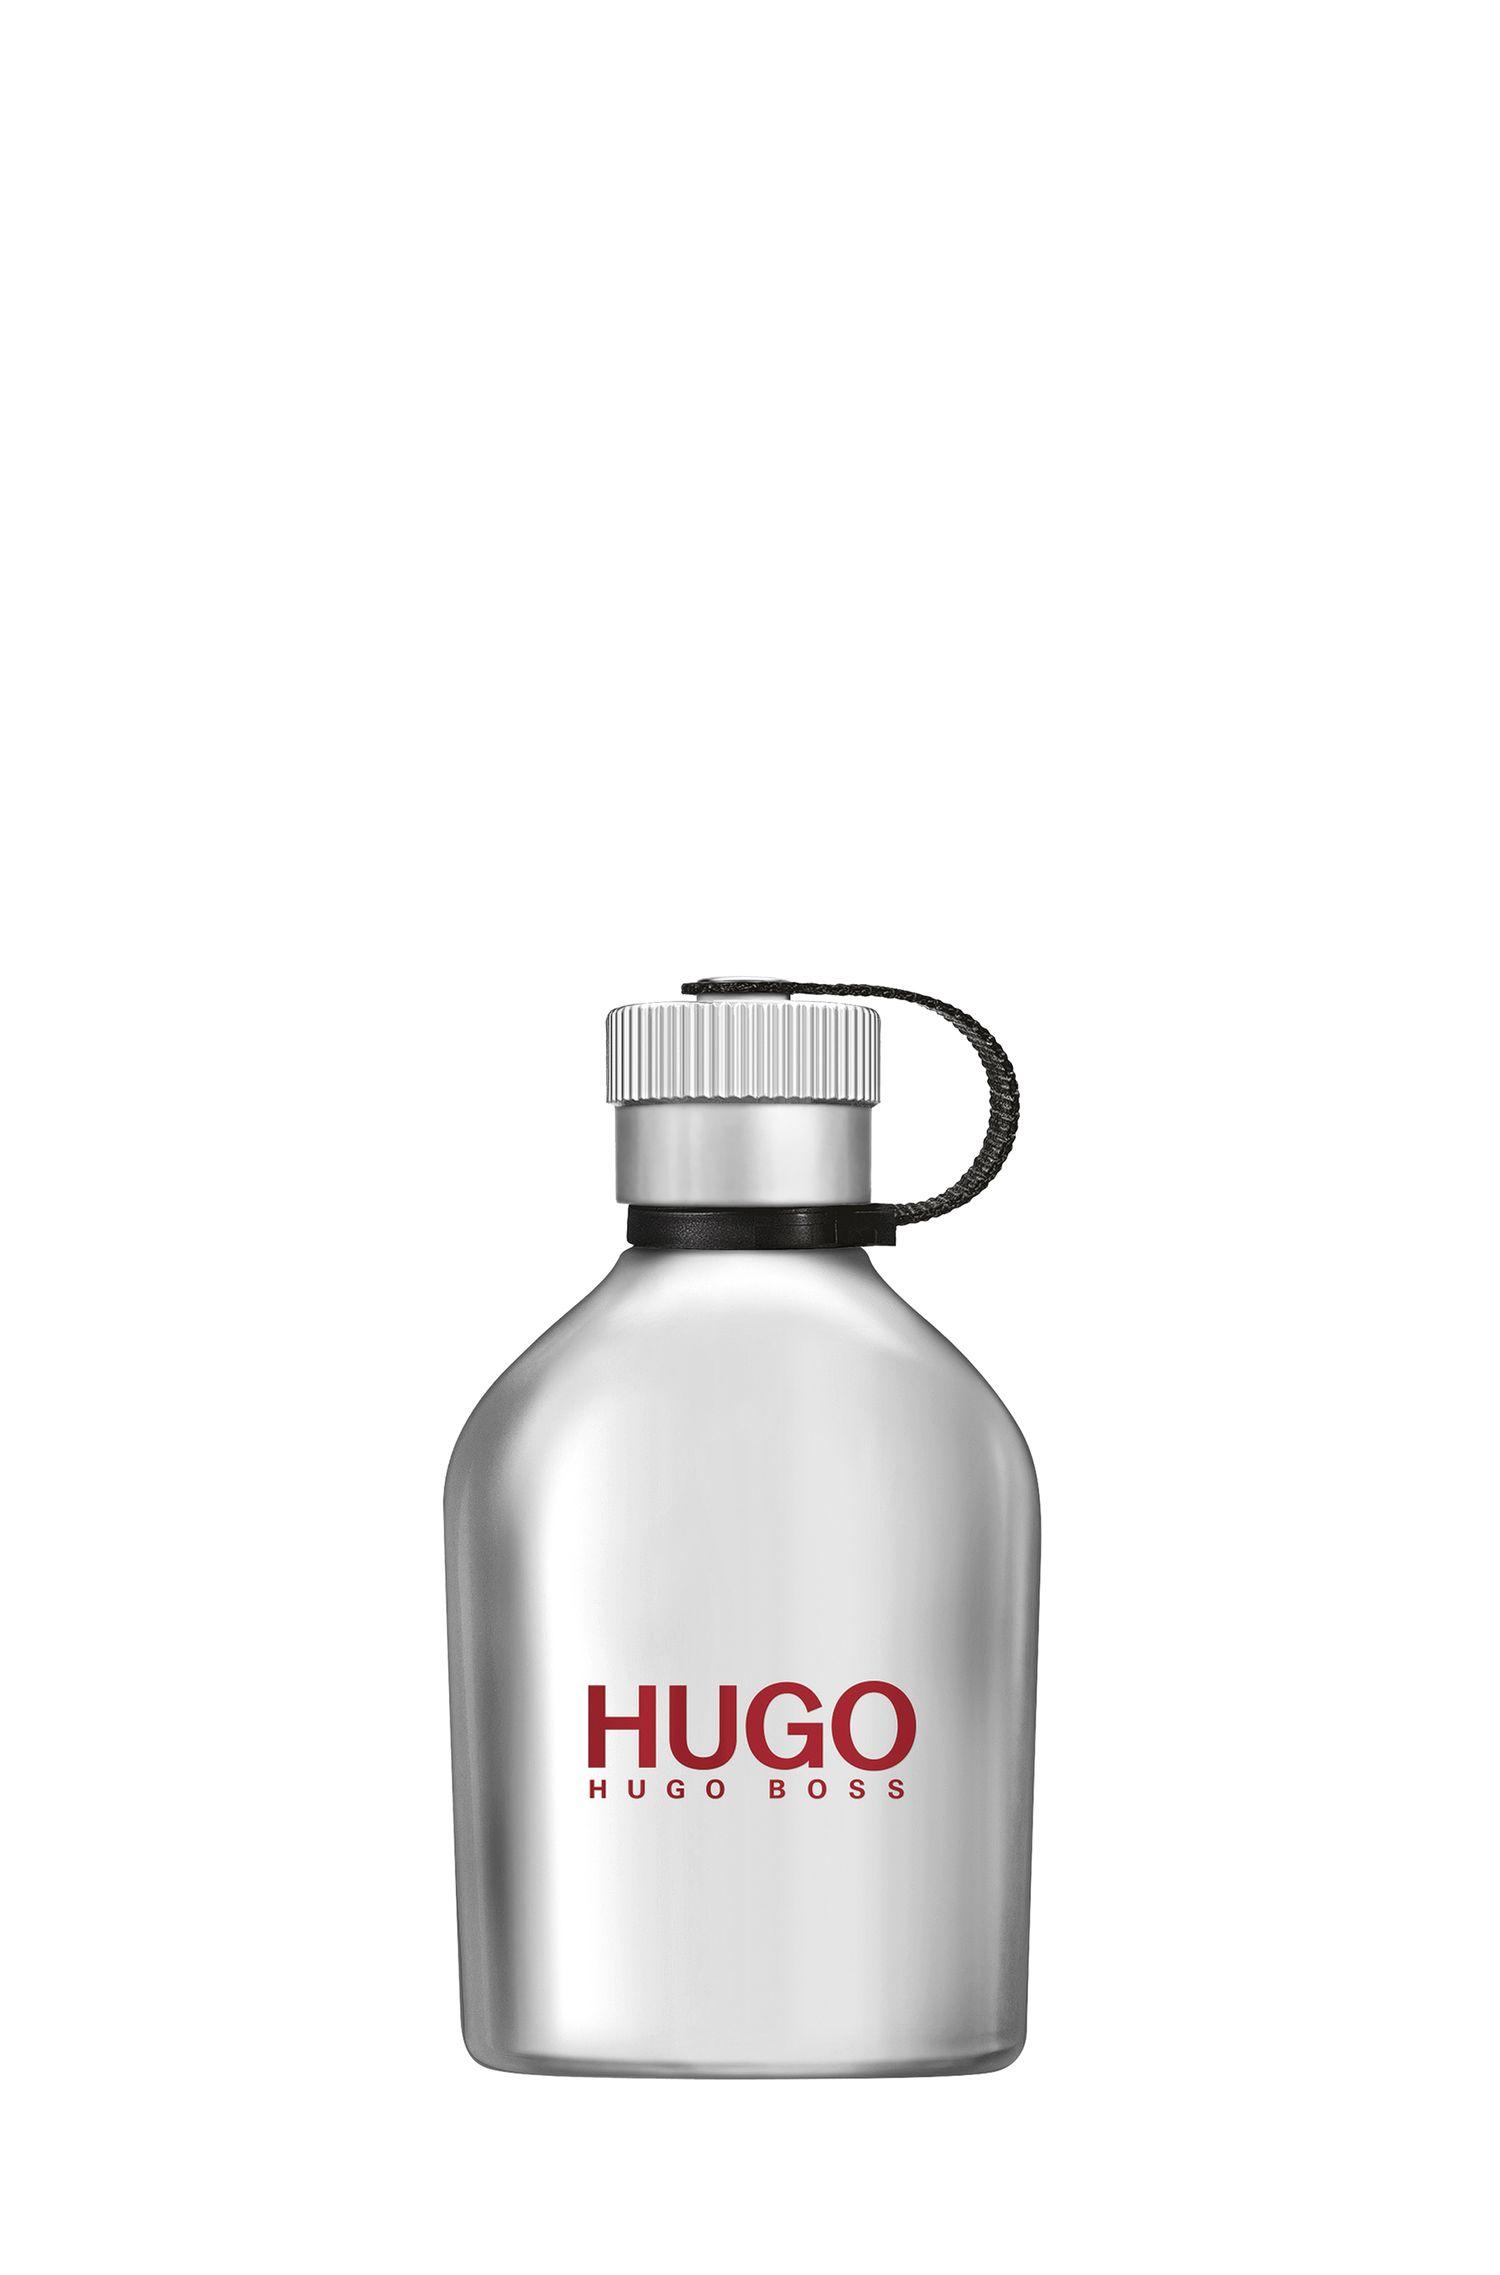 HUGO BOSS Hugo Boss Hugo Iced Eau de Toilette 125 ml One Size Assorted-Pre-Pack